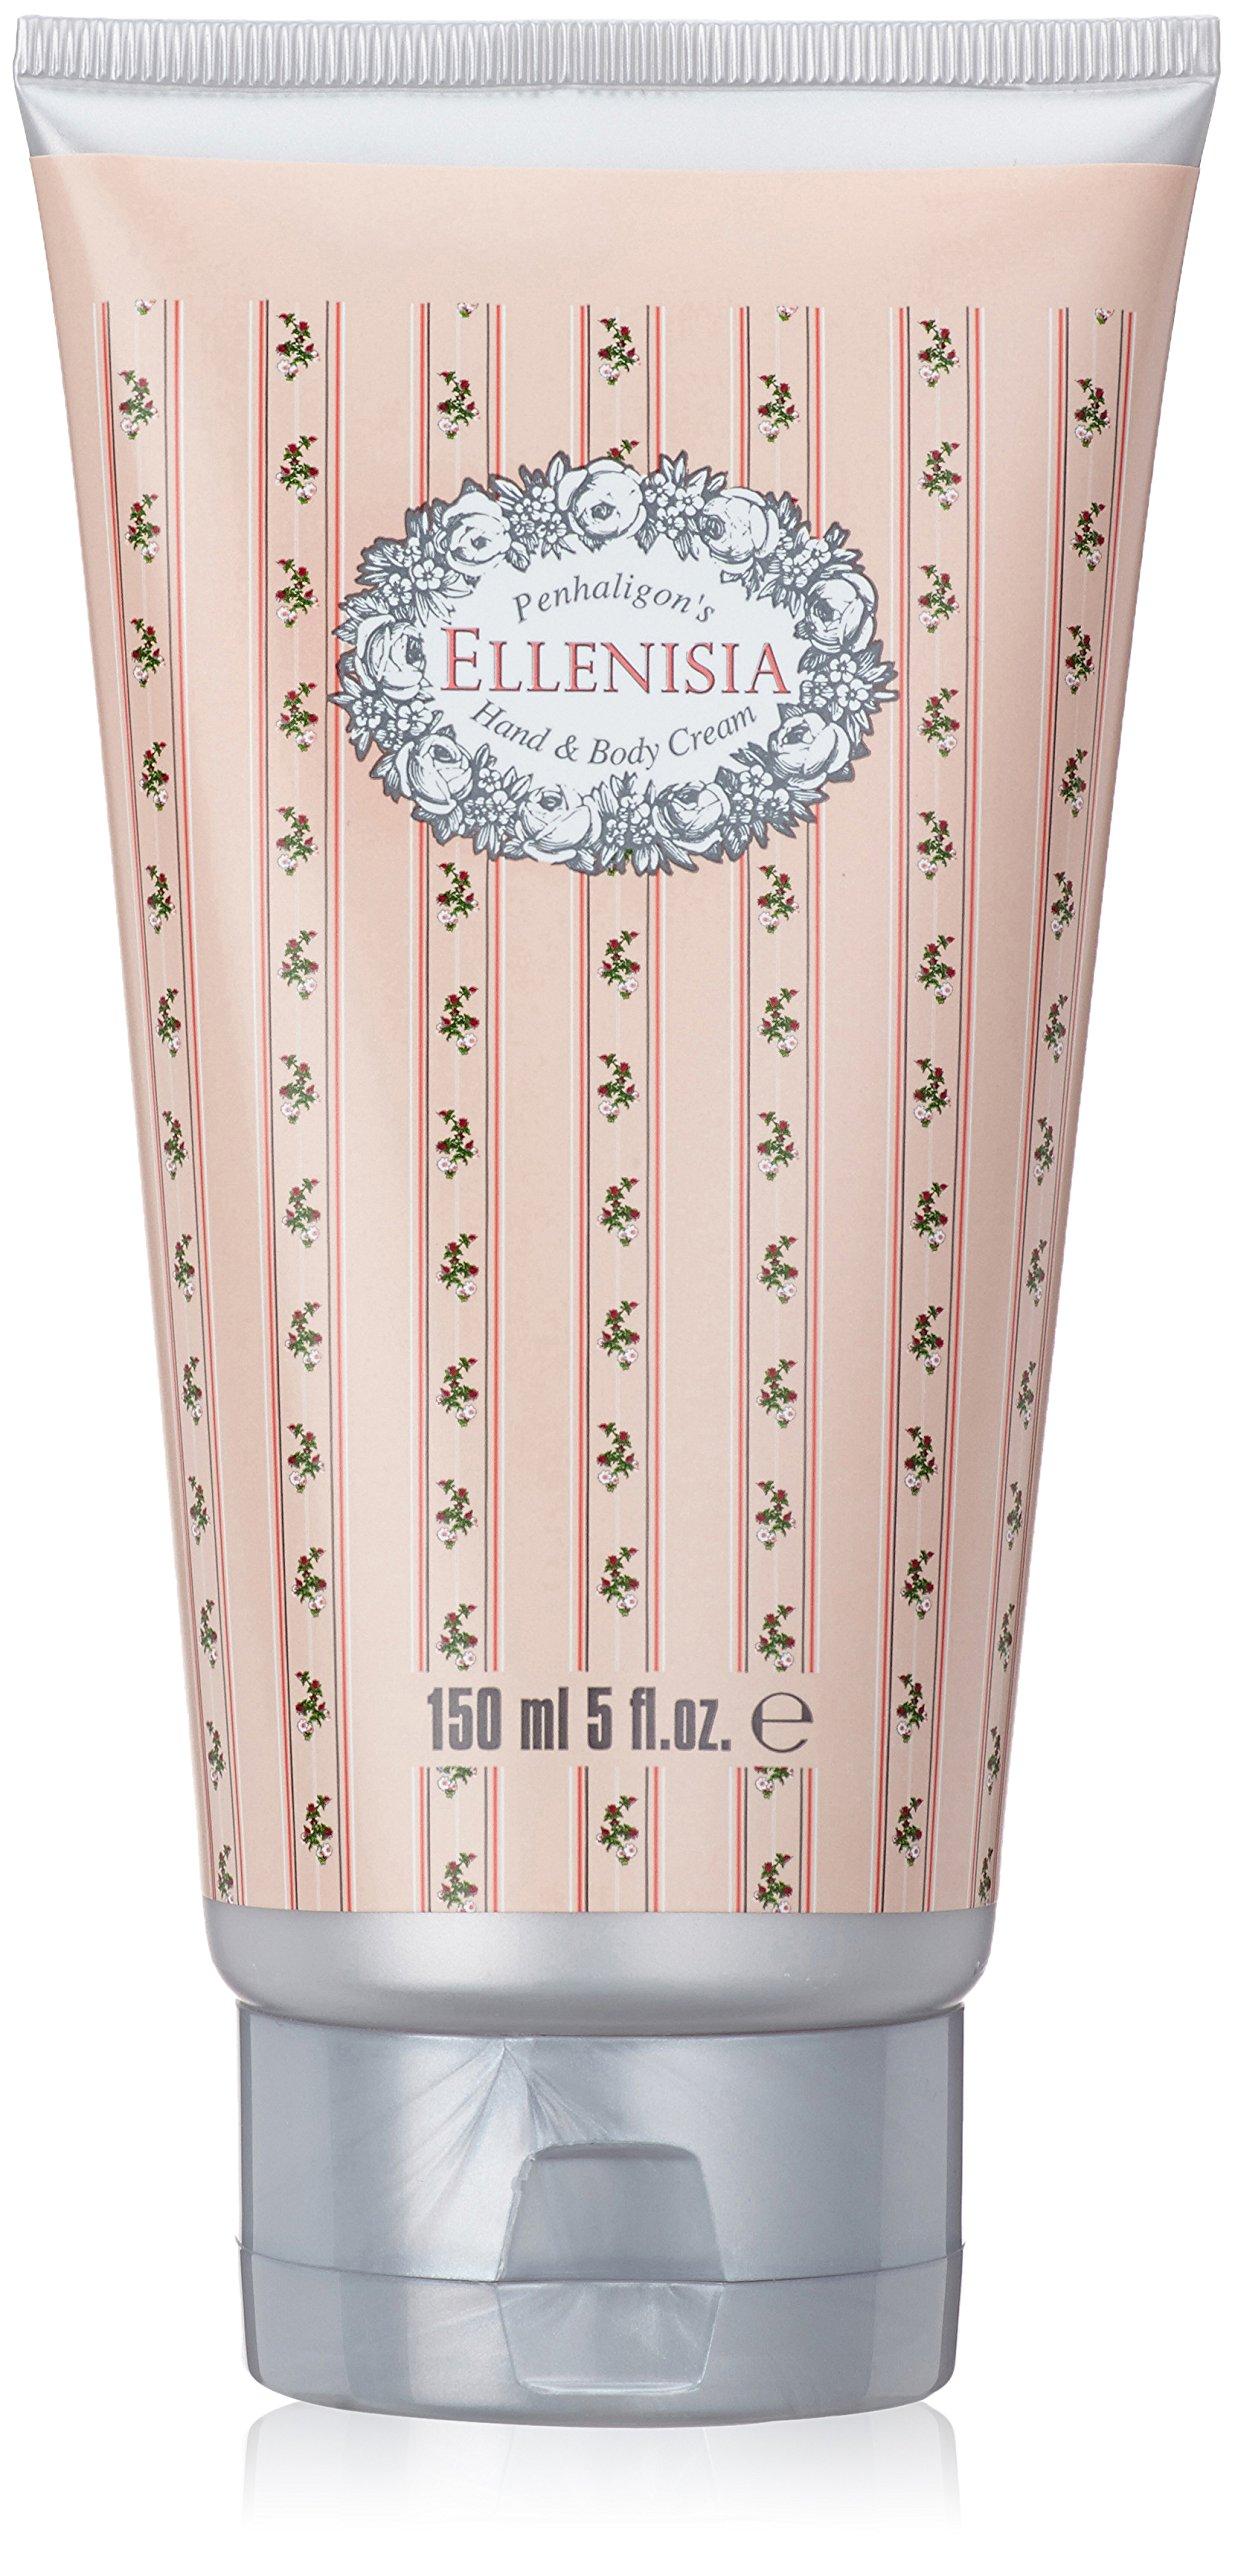 Penhaligon's London Ellenisia for Women 5.0 oz Hand & Body Cream